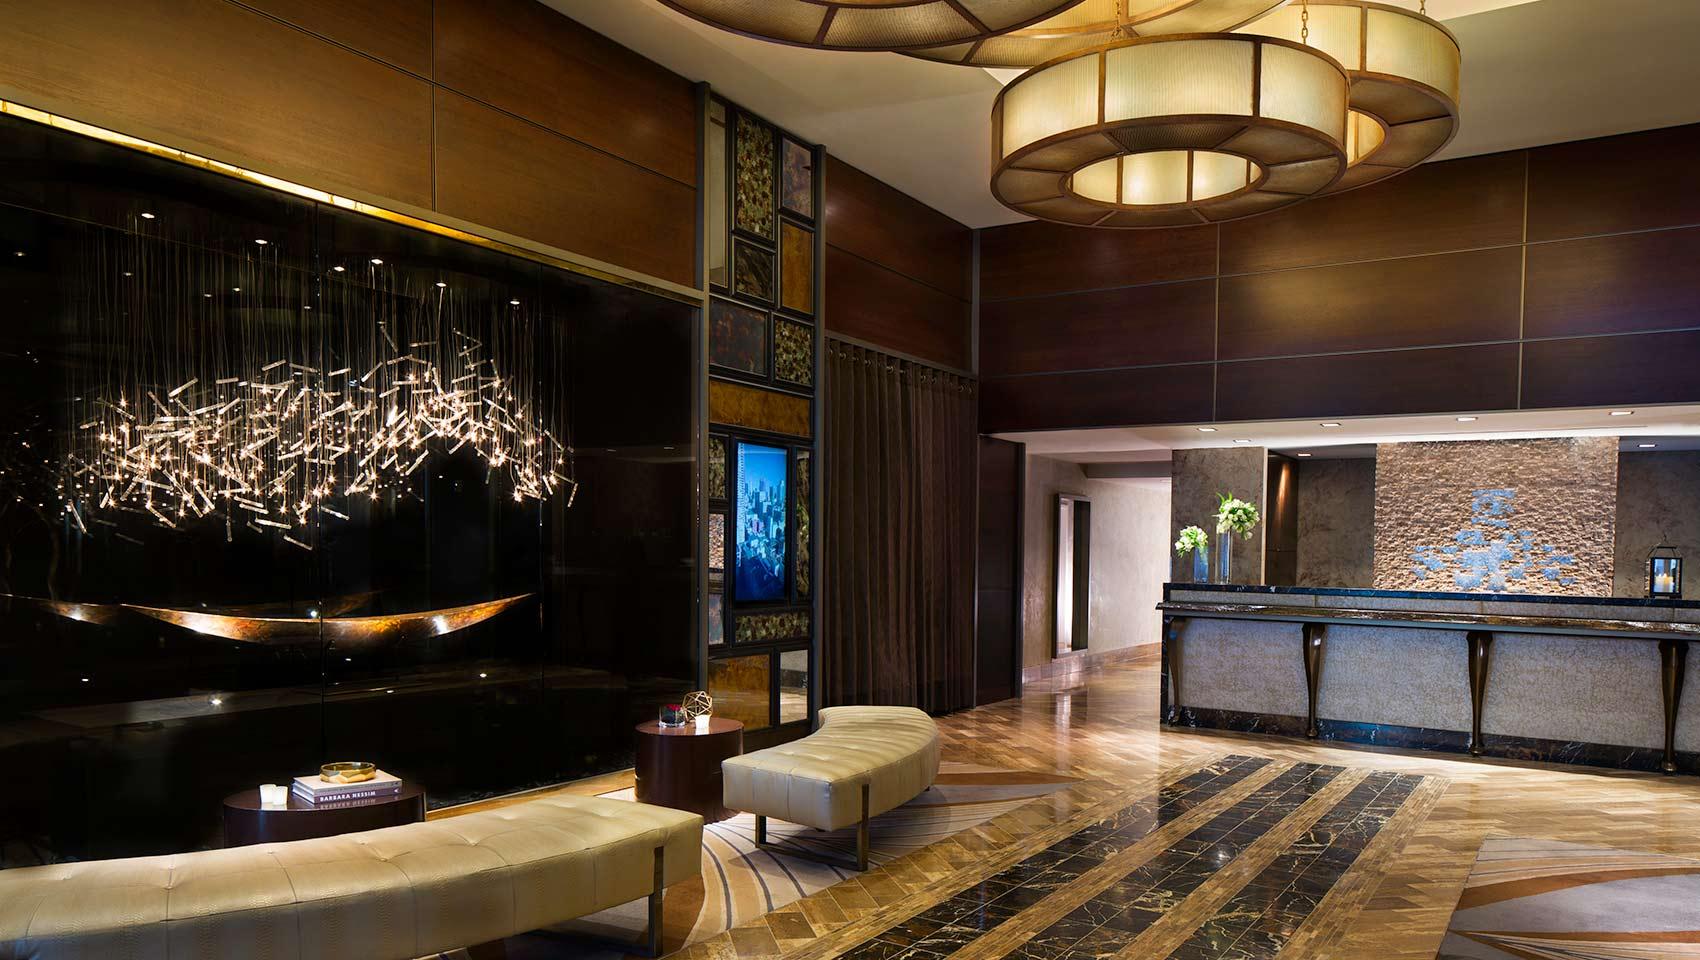 (c) The Kimpton Muse Hotel